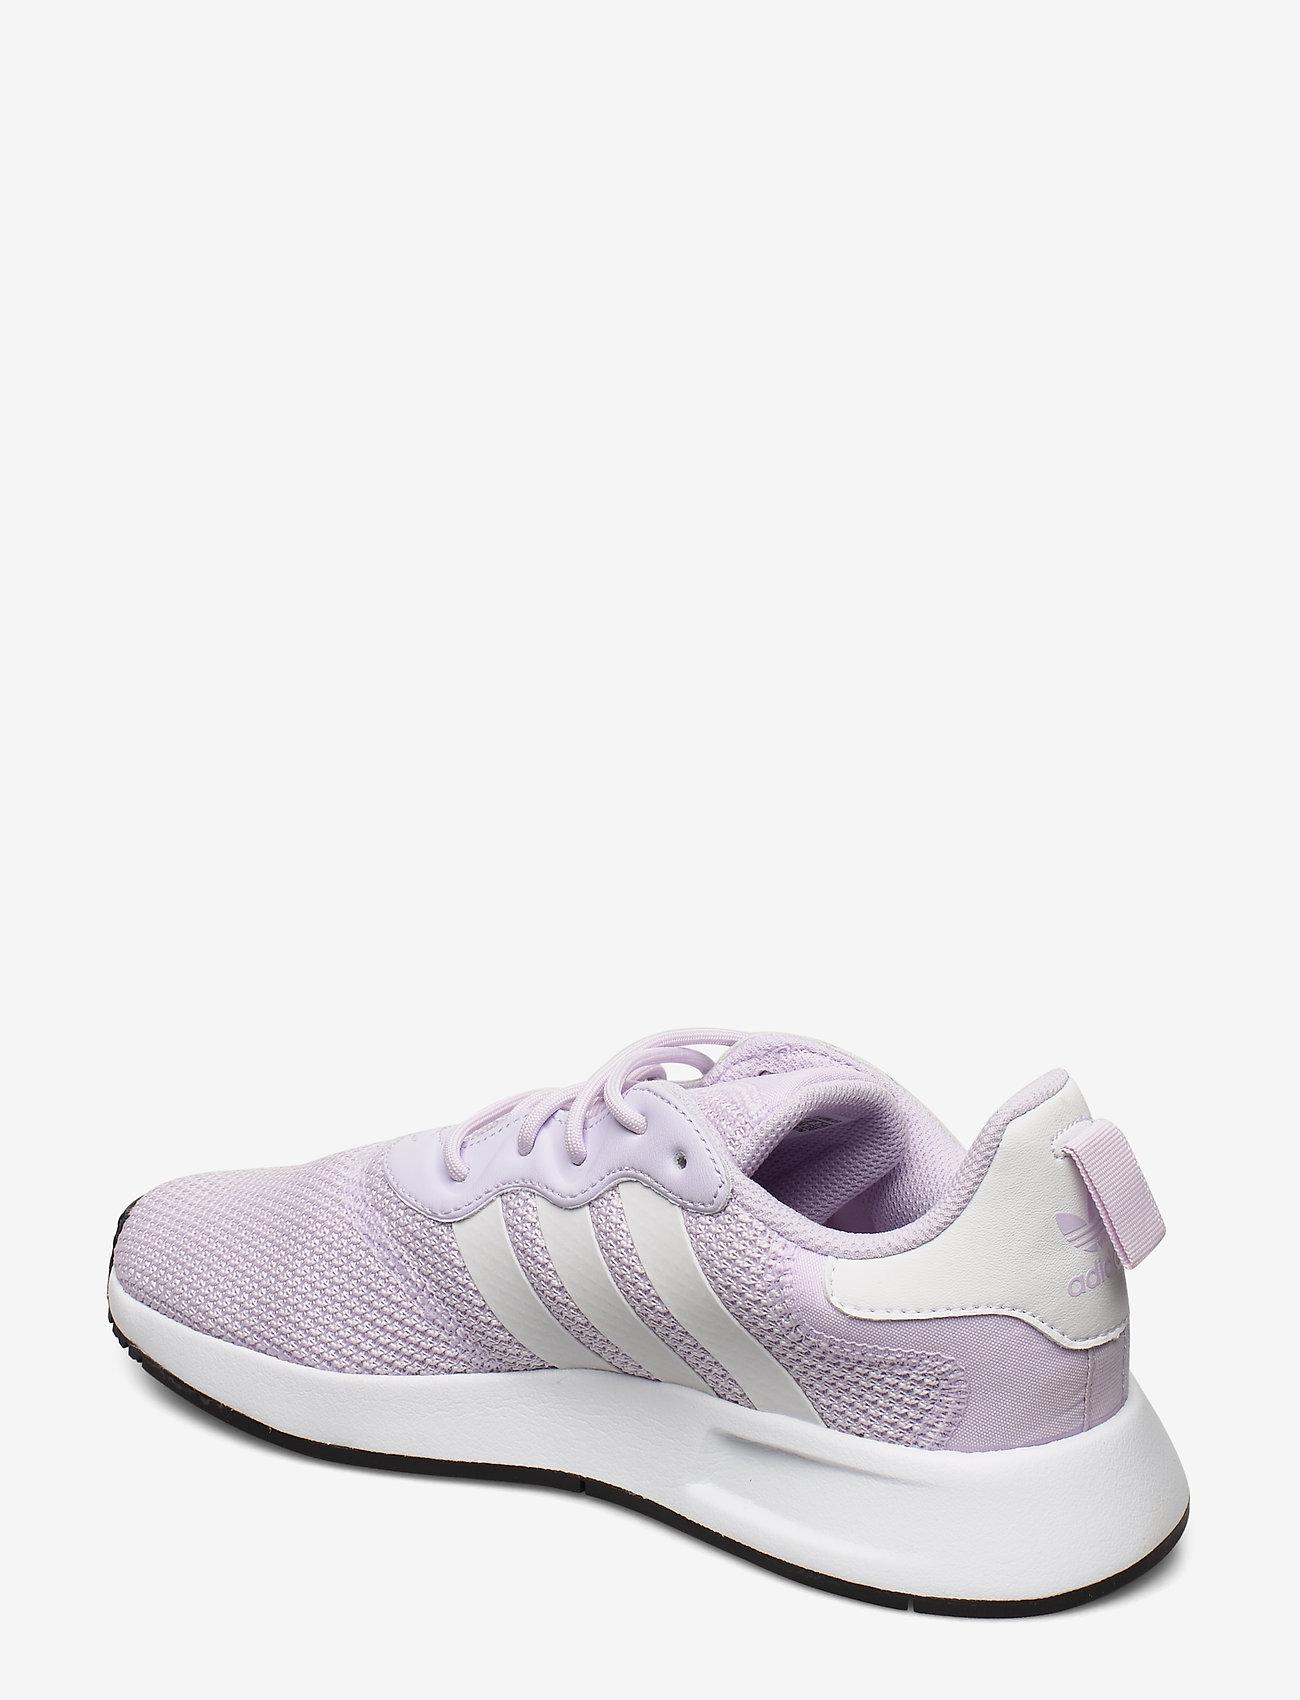 X_plr S W (Prptnt/ftwwht/cblack) - adidas Originals